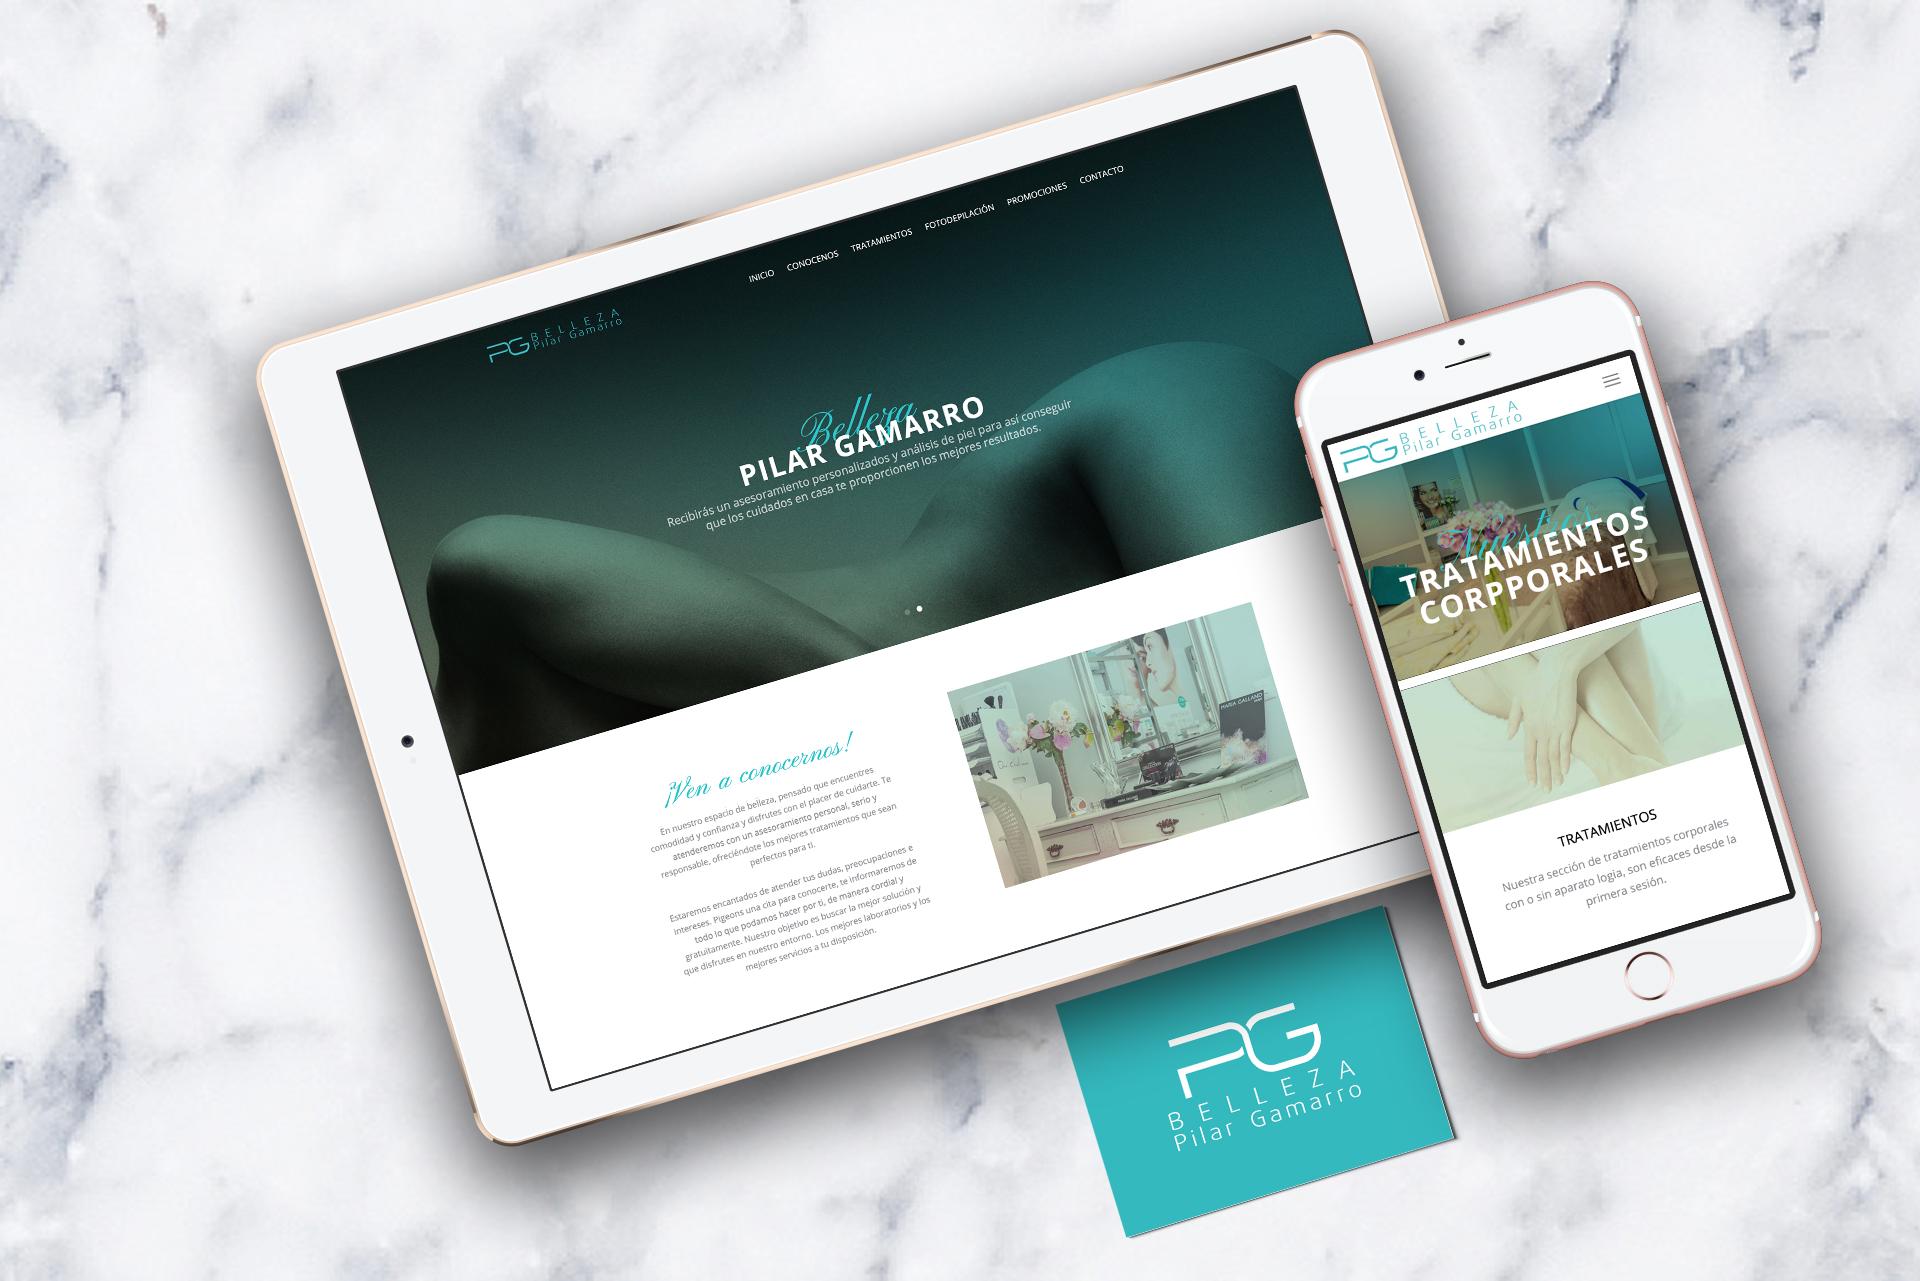 Belleza Pilar Gamarro - Web Design by NARAN-HO